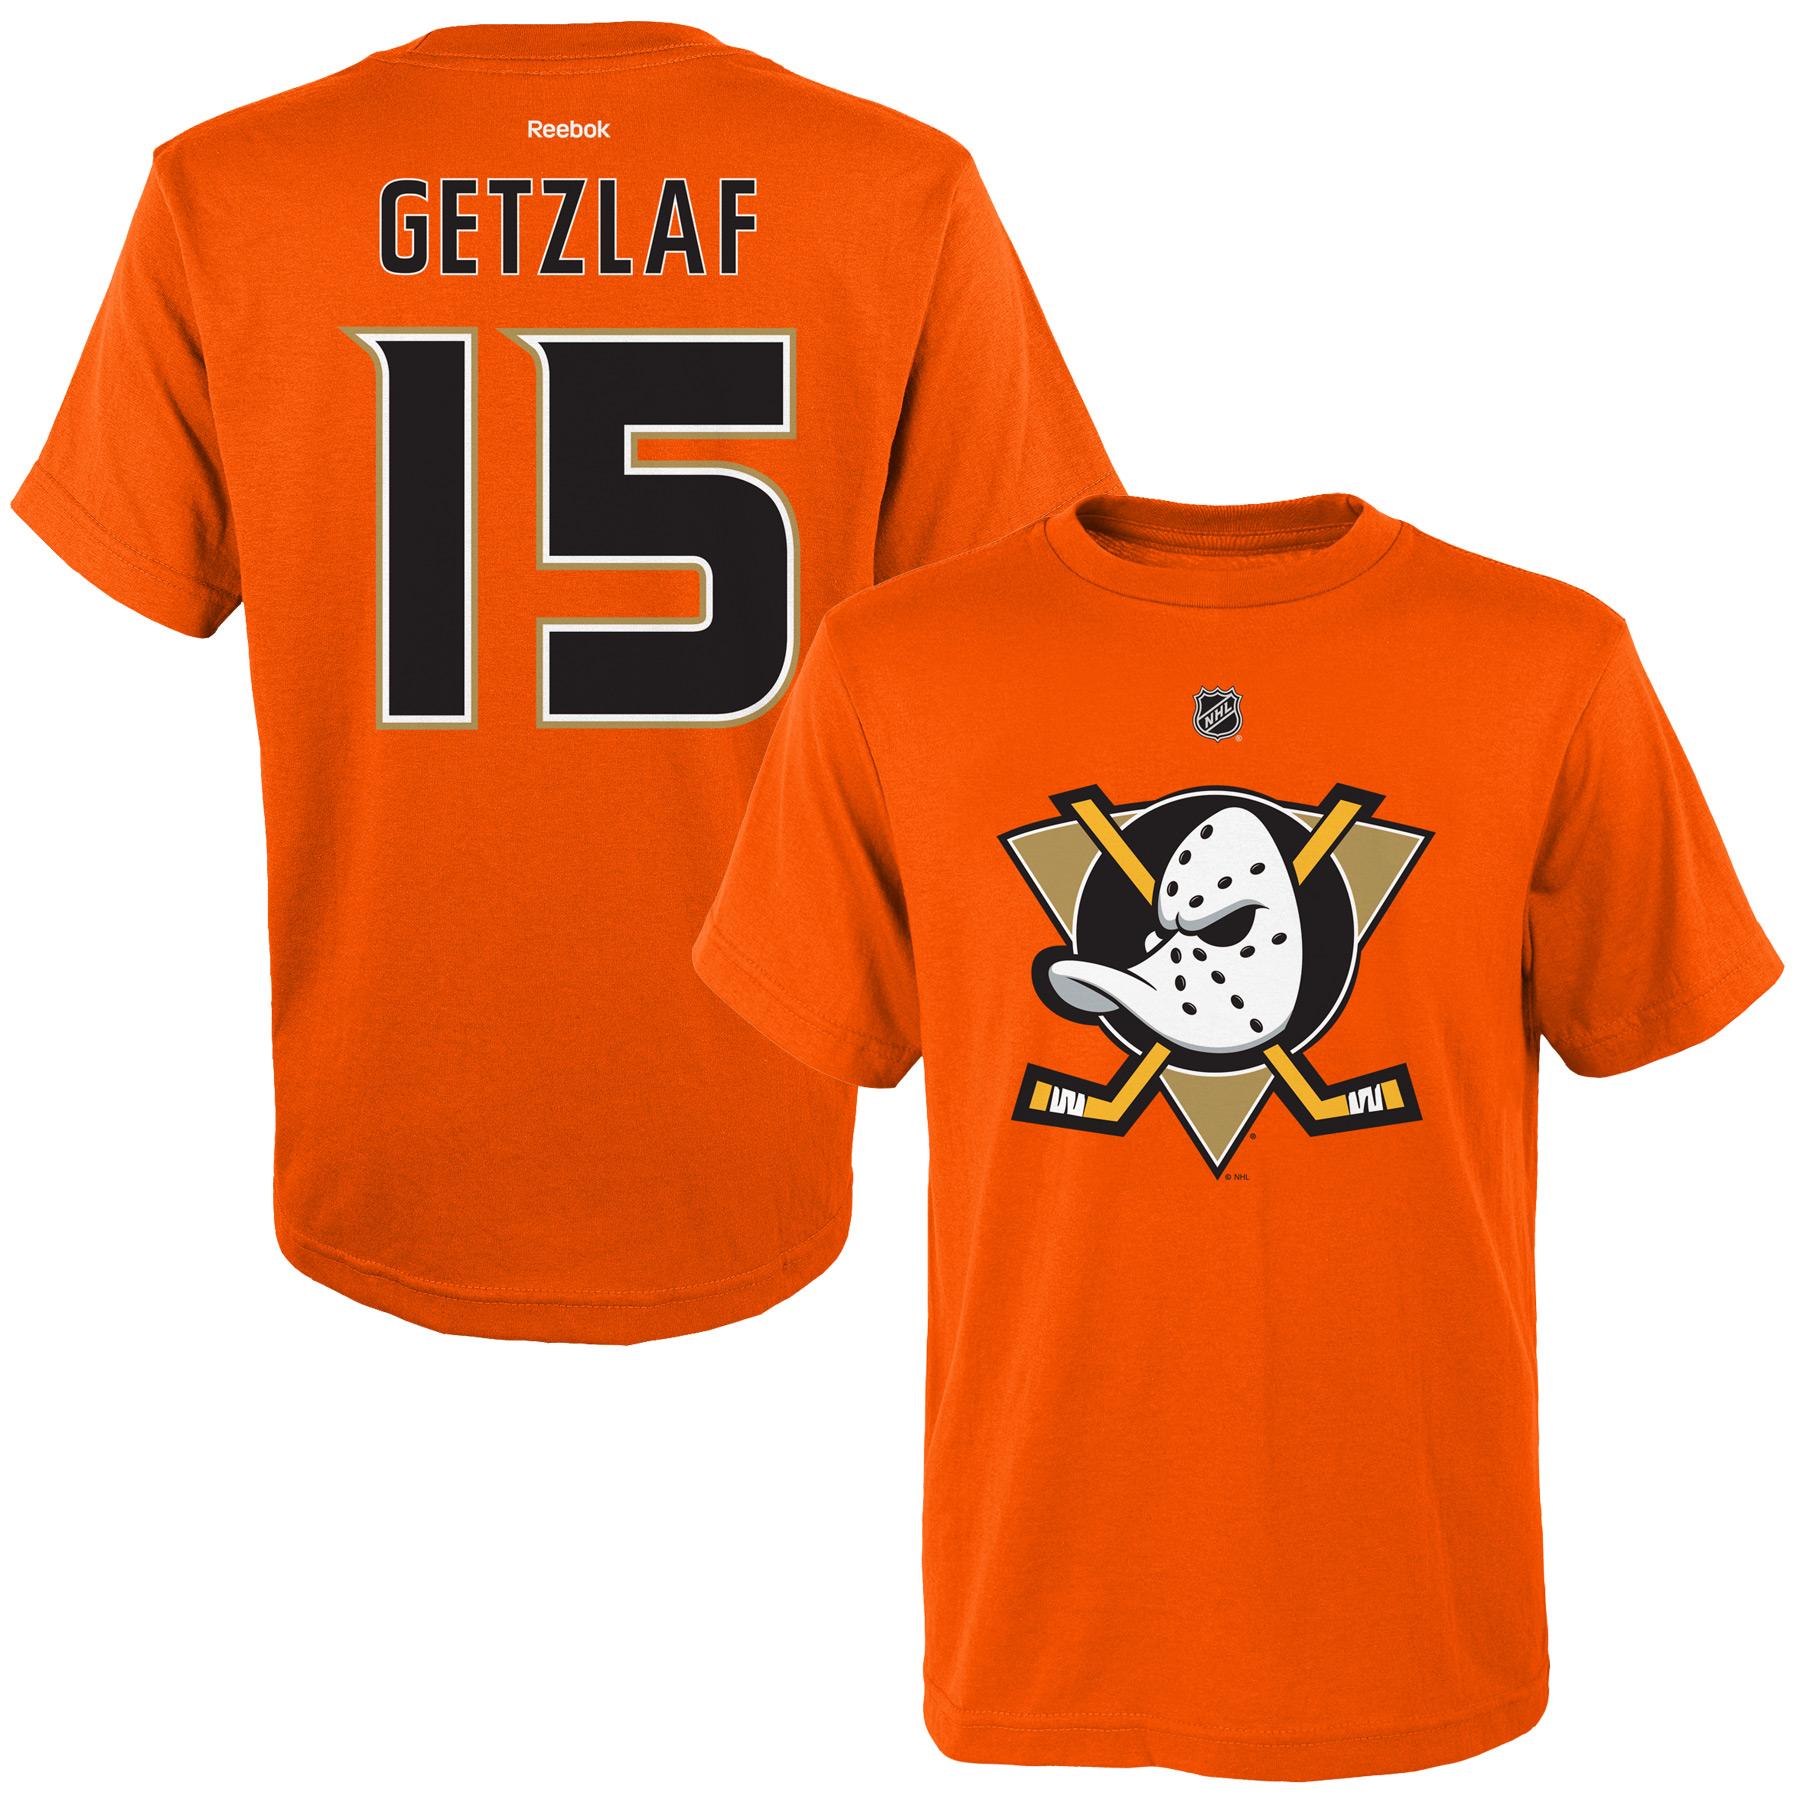 Reebok Dětské tričko Ryan Getzlaf Anaheim Ducks NHL Name & Number Velikost: Dětské M (9 - 11 let)